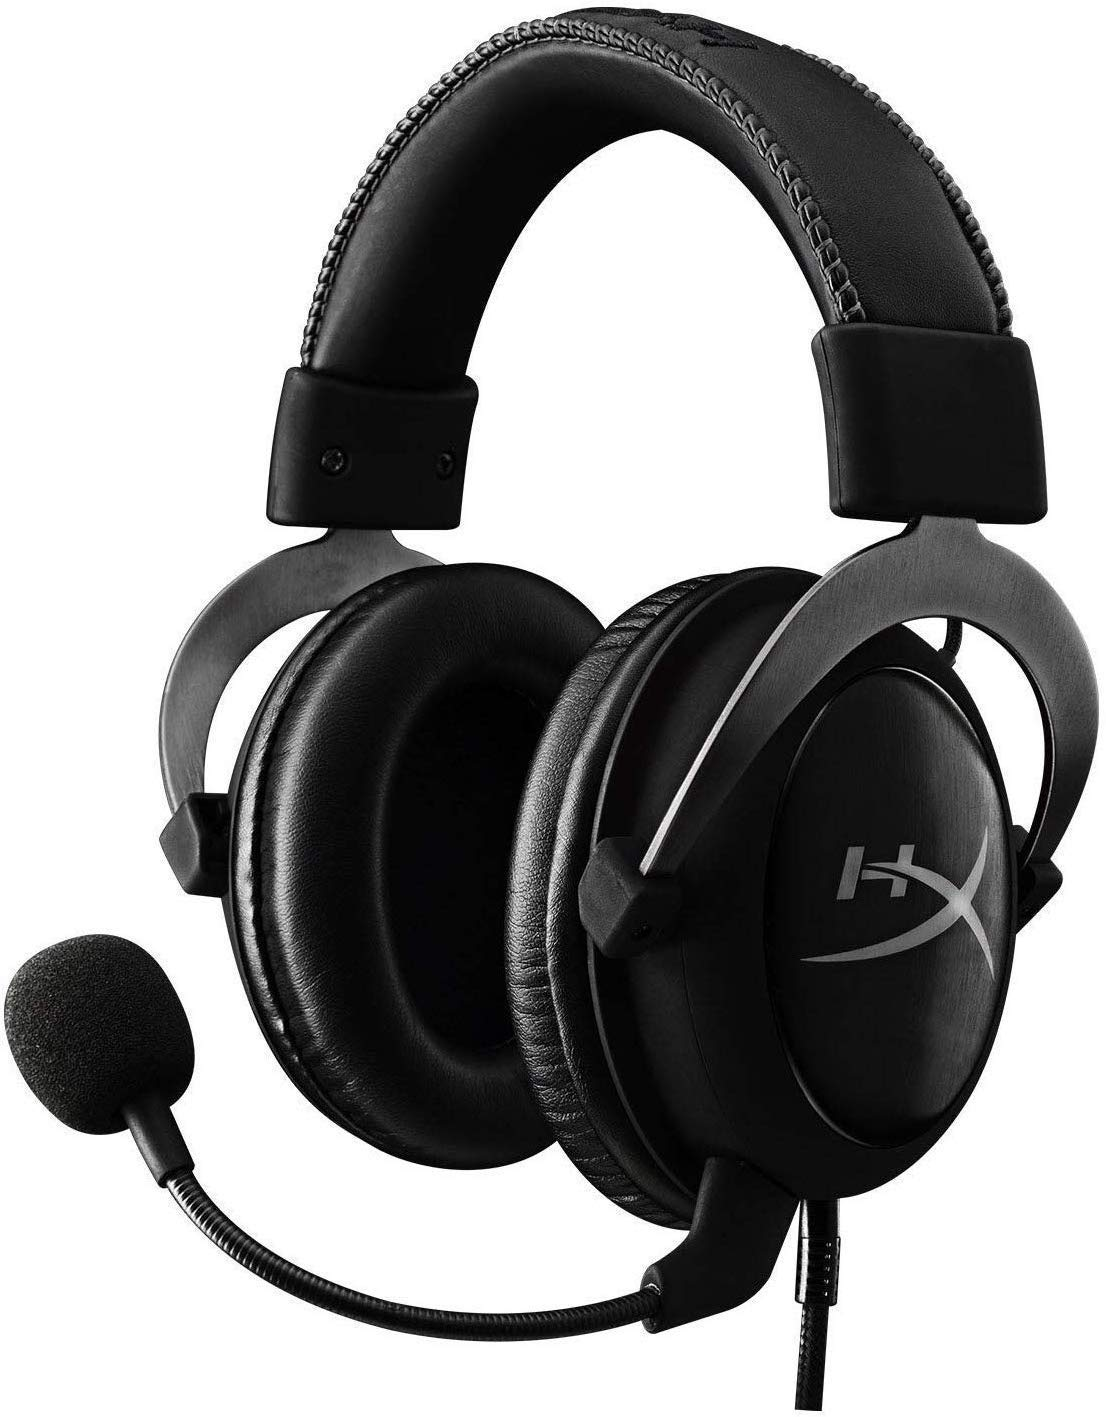 HyperX Cloud II Gaming Headset for PC,Xbox One,PS4 - Gun Metal